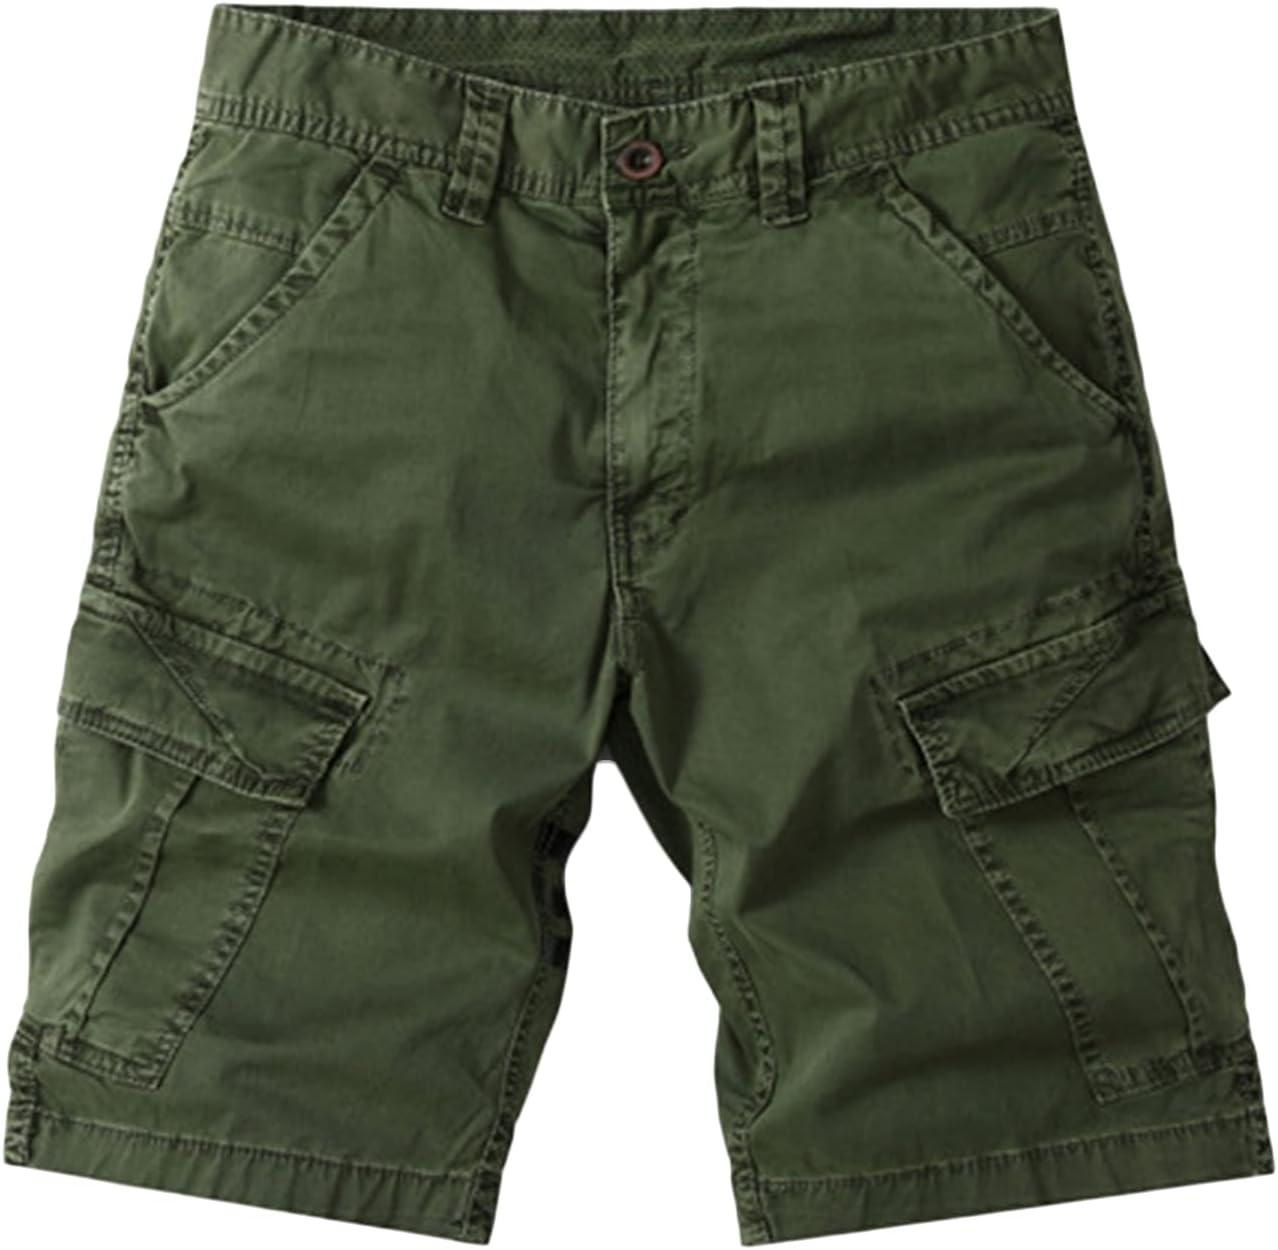 New Orleans Mall Men's Slim Fit Bargain sale Cargo Shorts Pockets Twill Multi Camo Casu